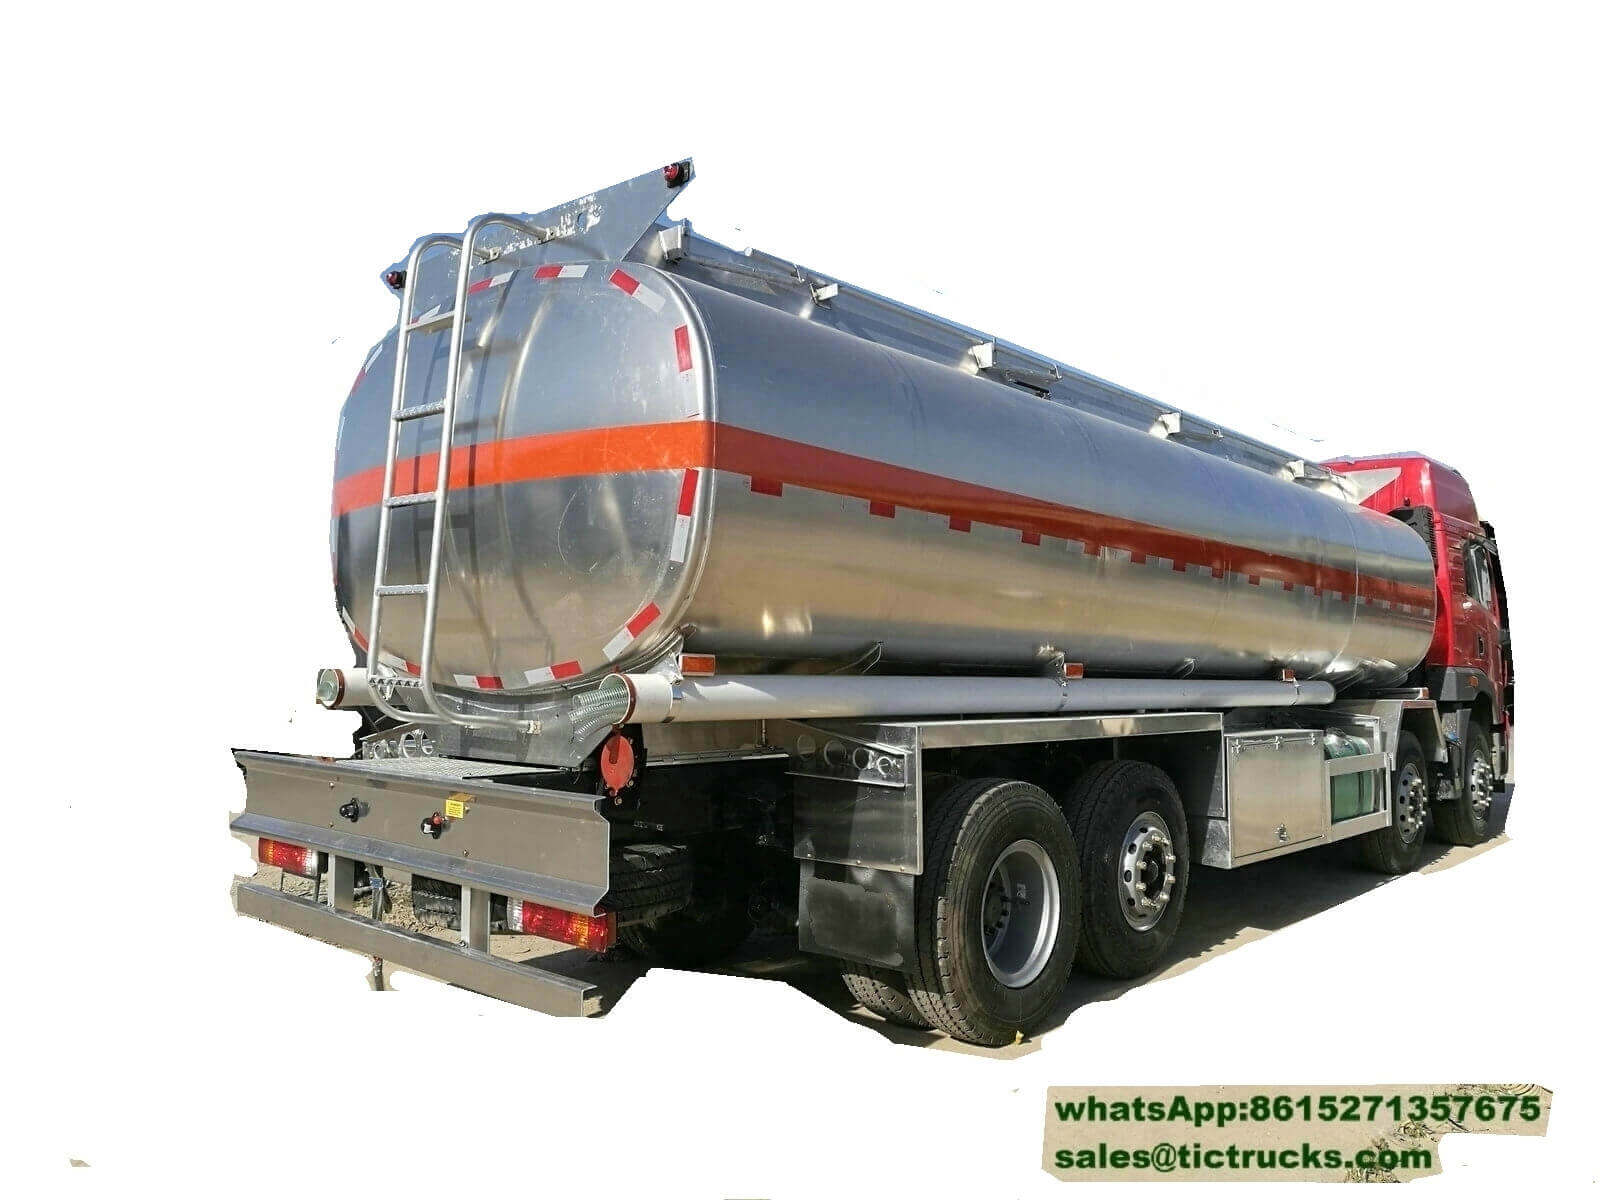 Camion-citerne -005-FAW-truck_1.jpg d'alliage d'aluminium